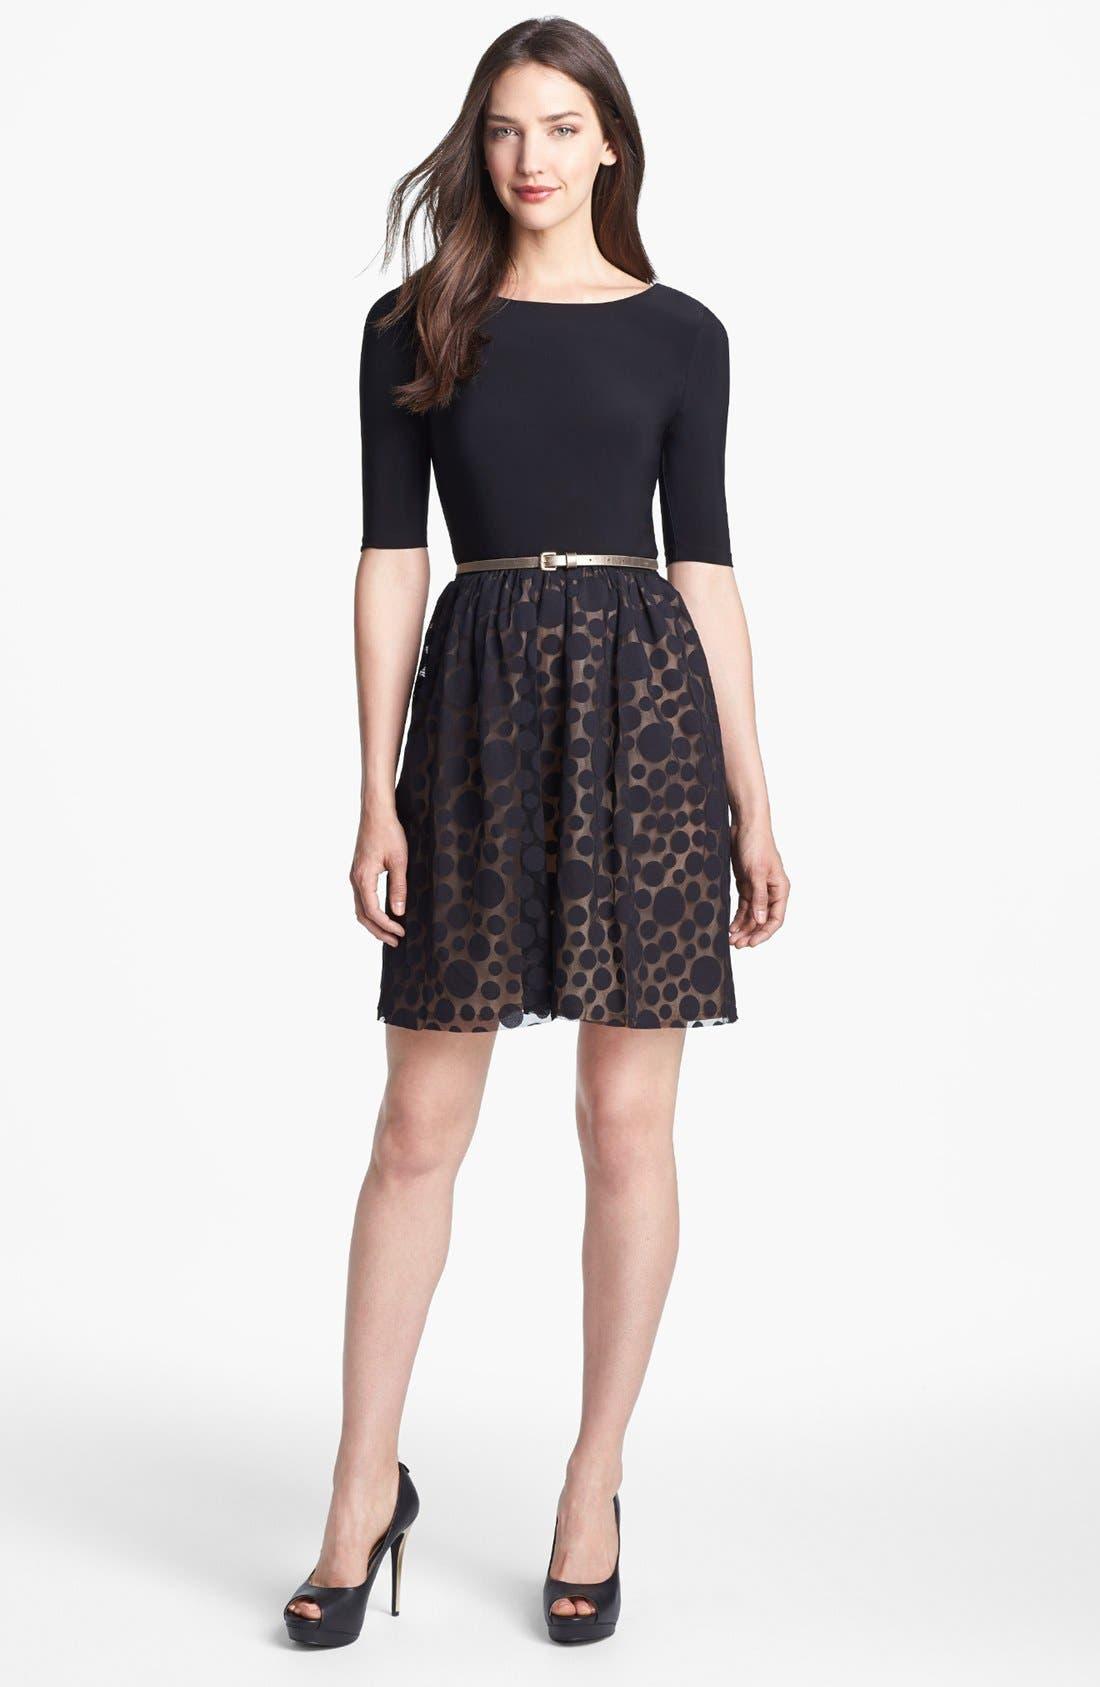 Alternate Image 1 Selected - Eliza J Mixed Media Fit & Flare Dress (Petite)